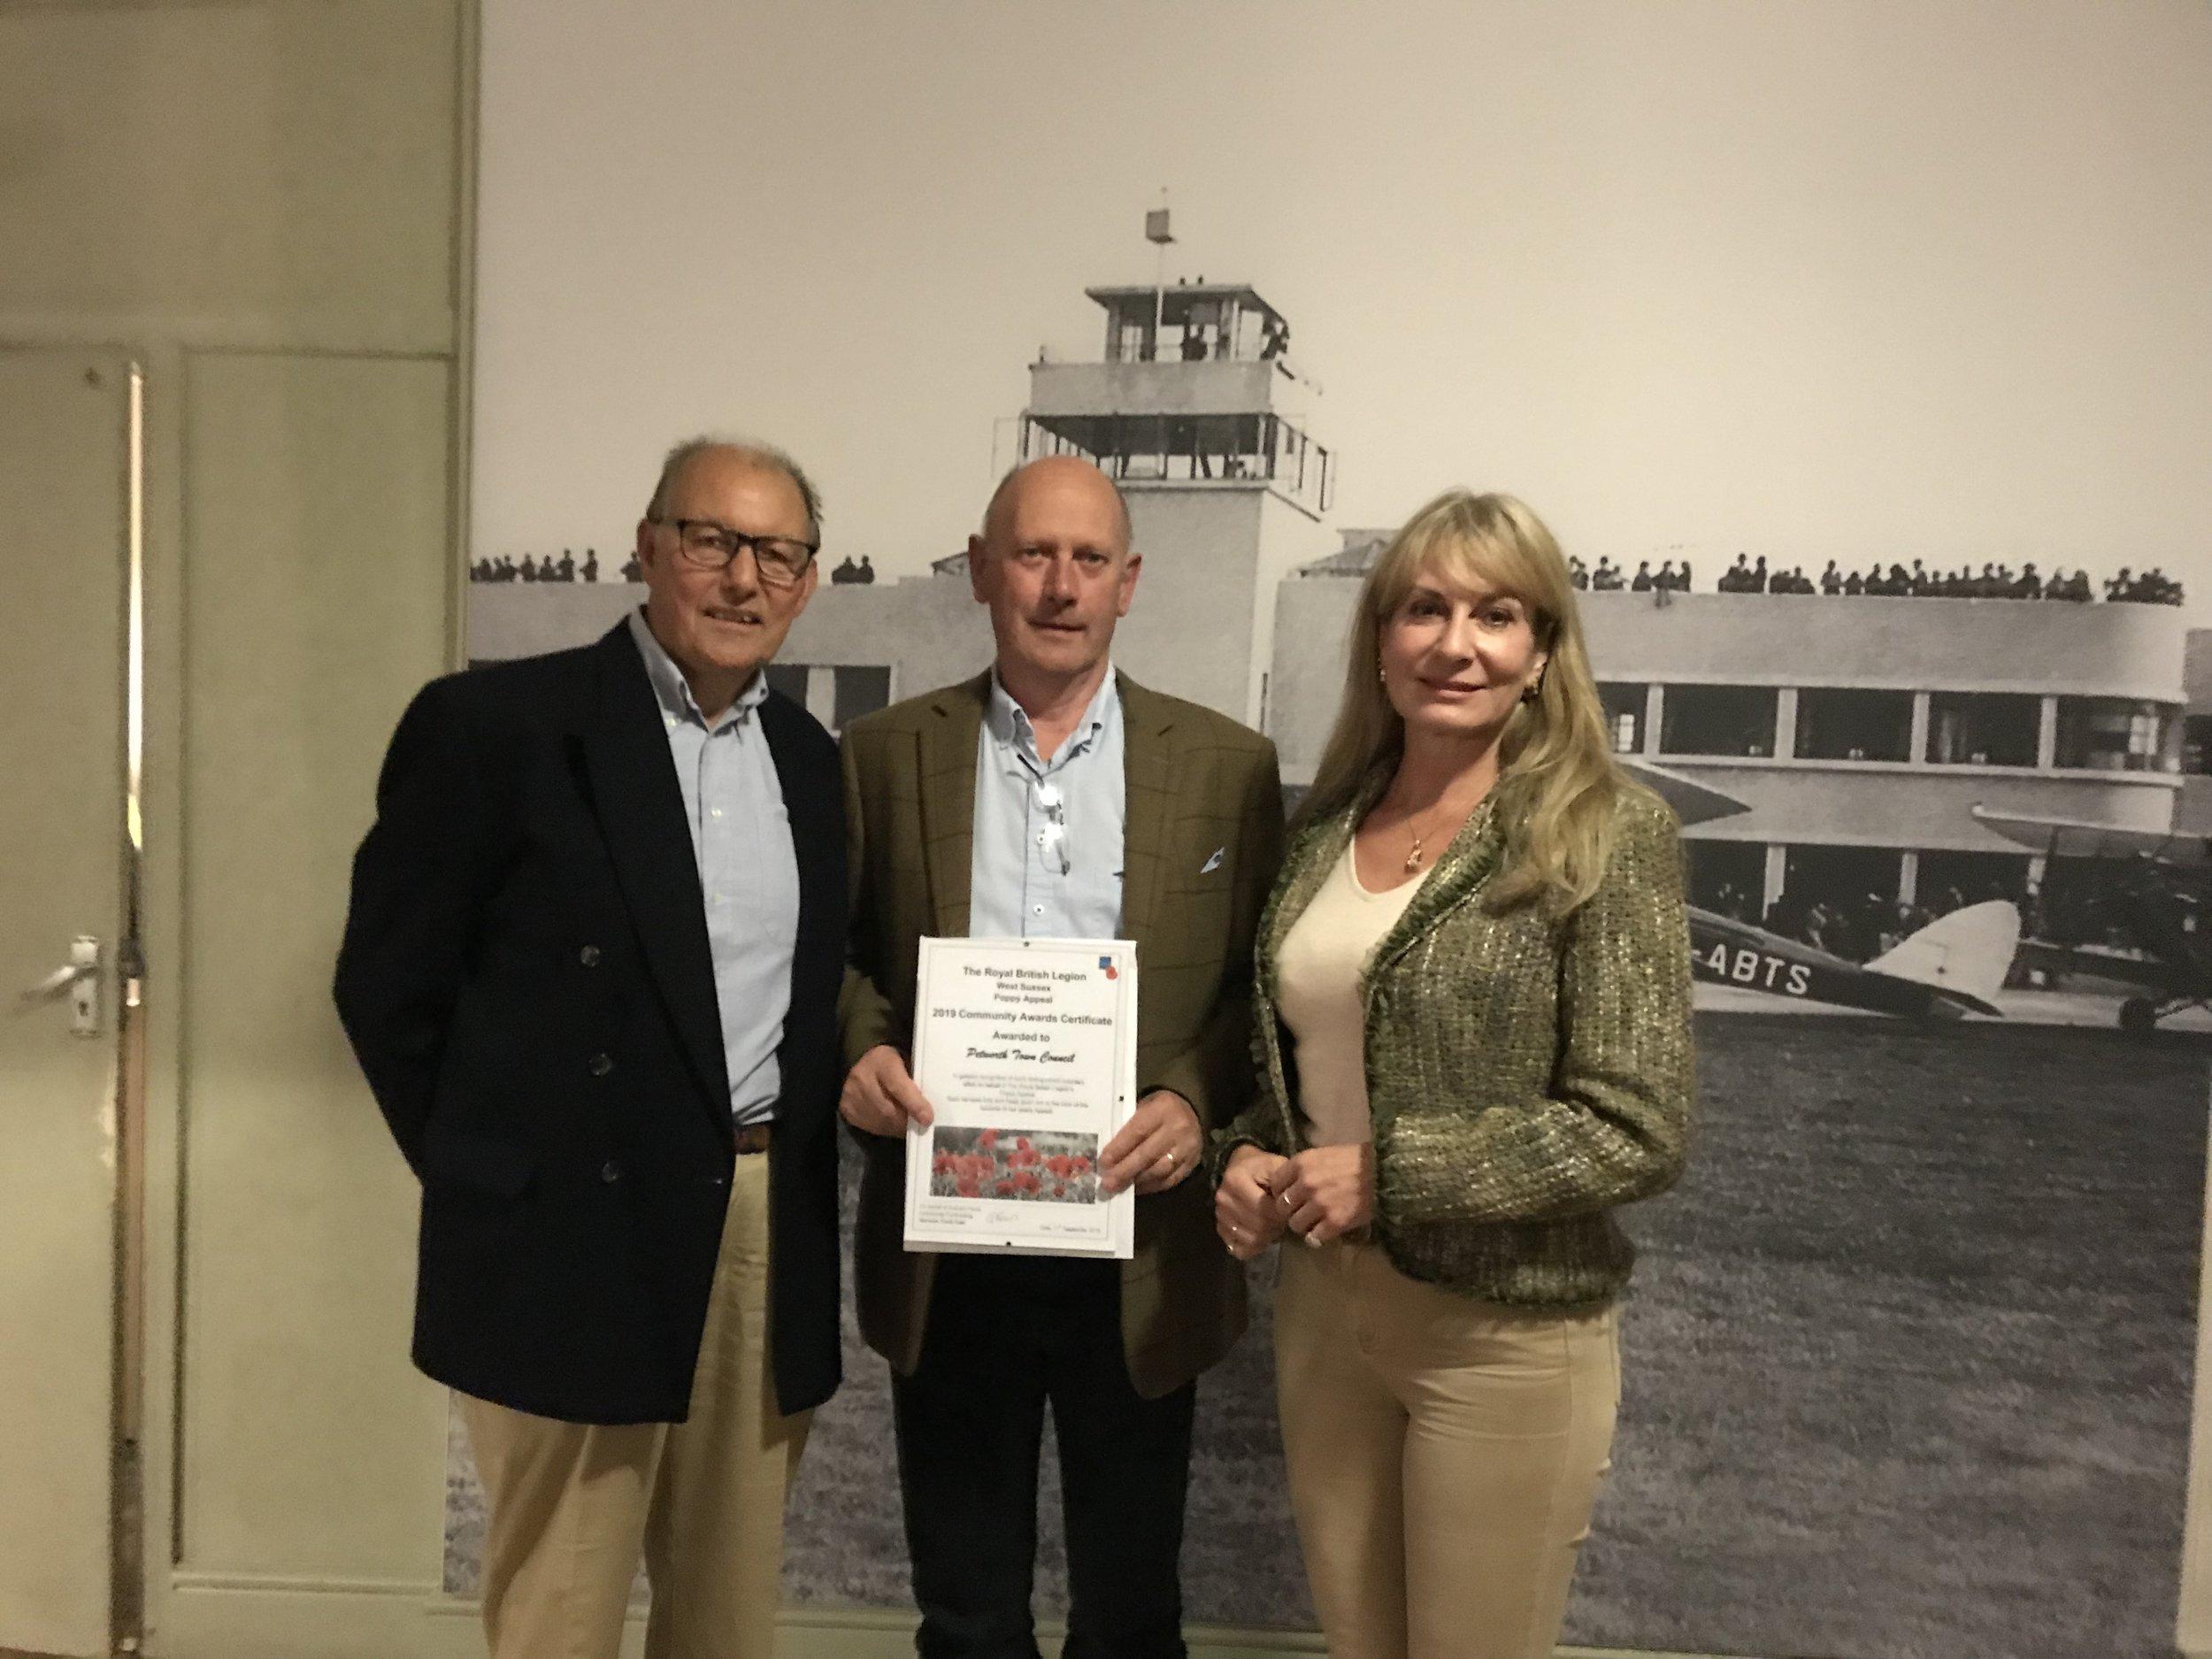 Royal British Legion Community Awards 2019